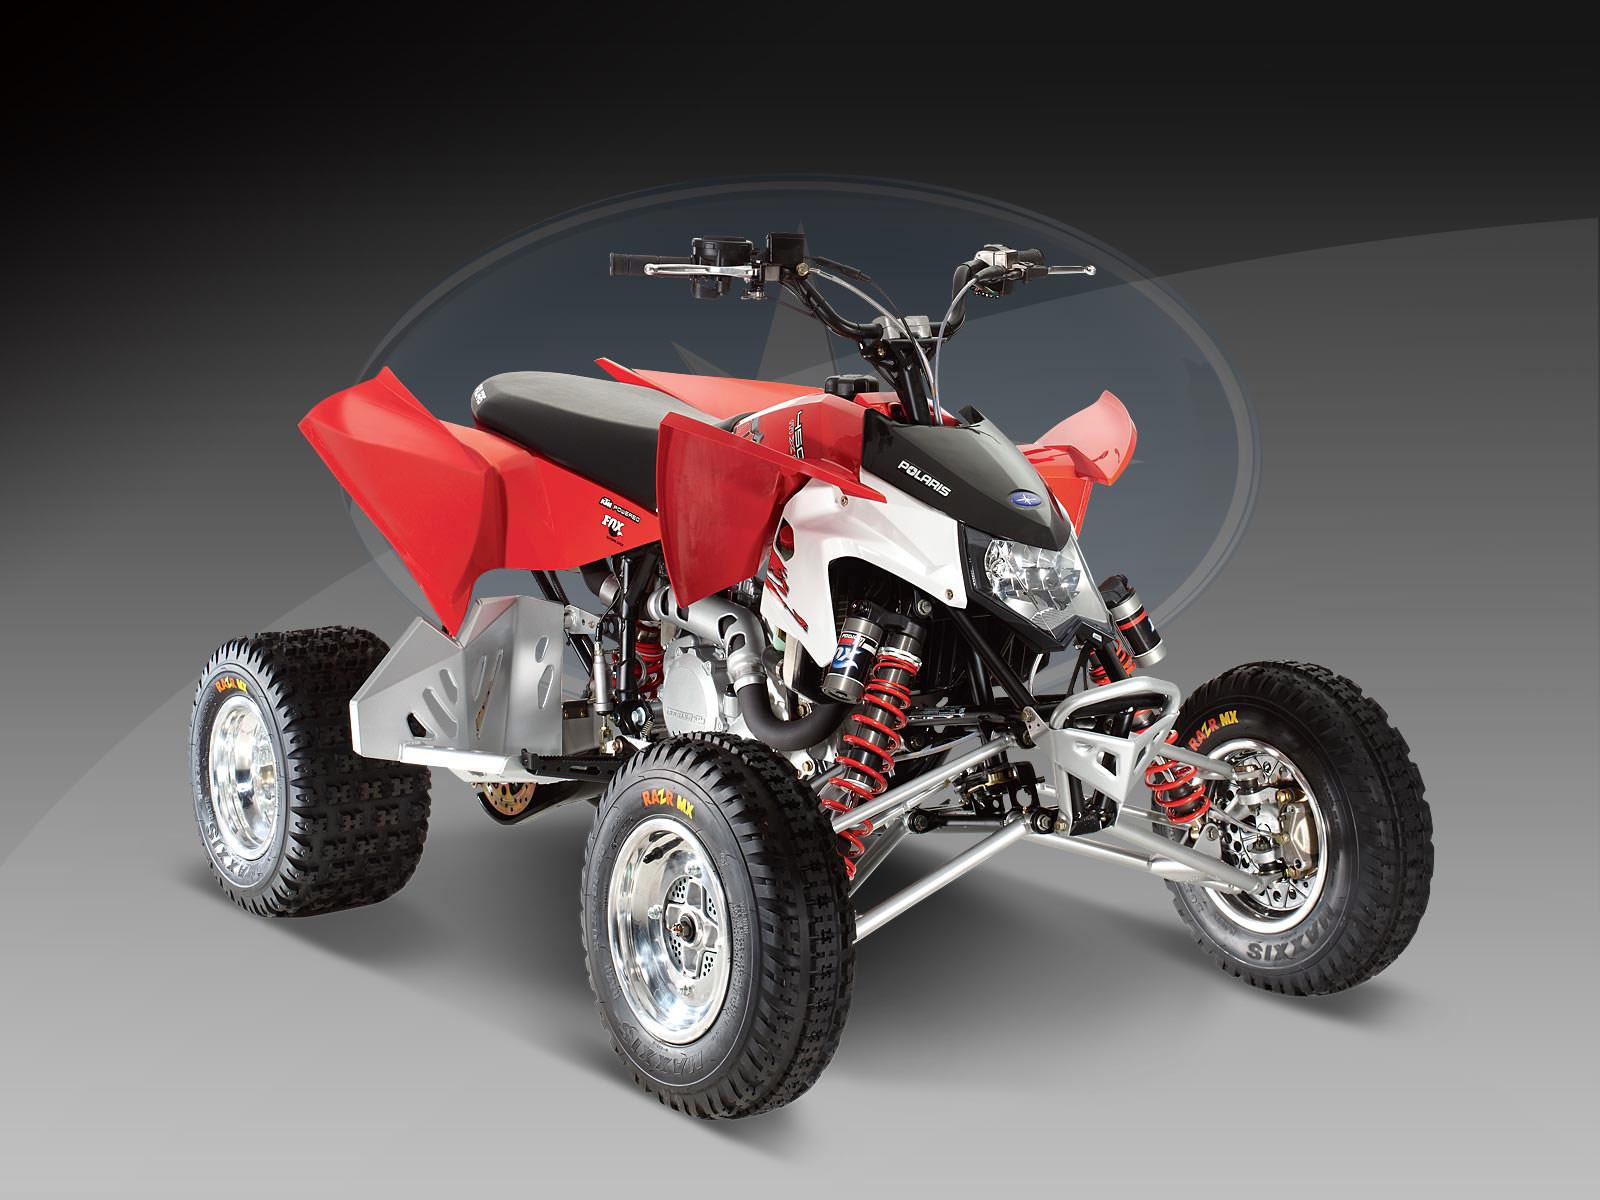 2010 POLARIS Outlaw 450 MXR ATV wallpapers 1600x1200